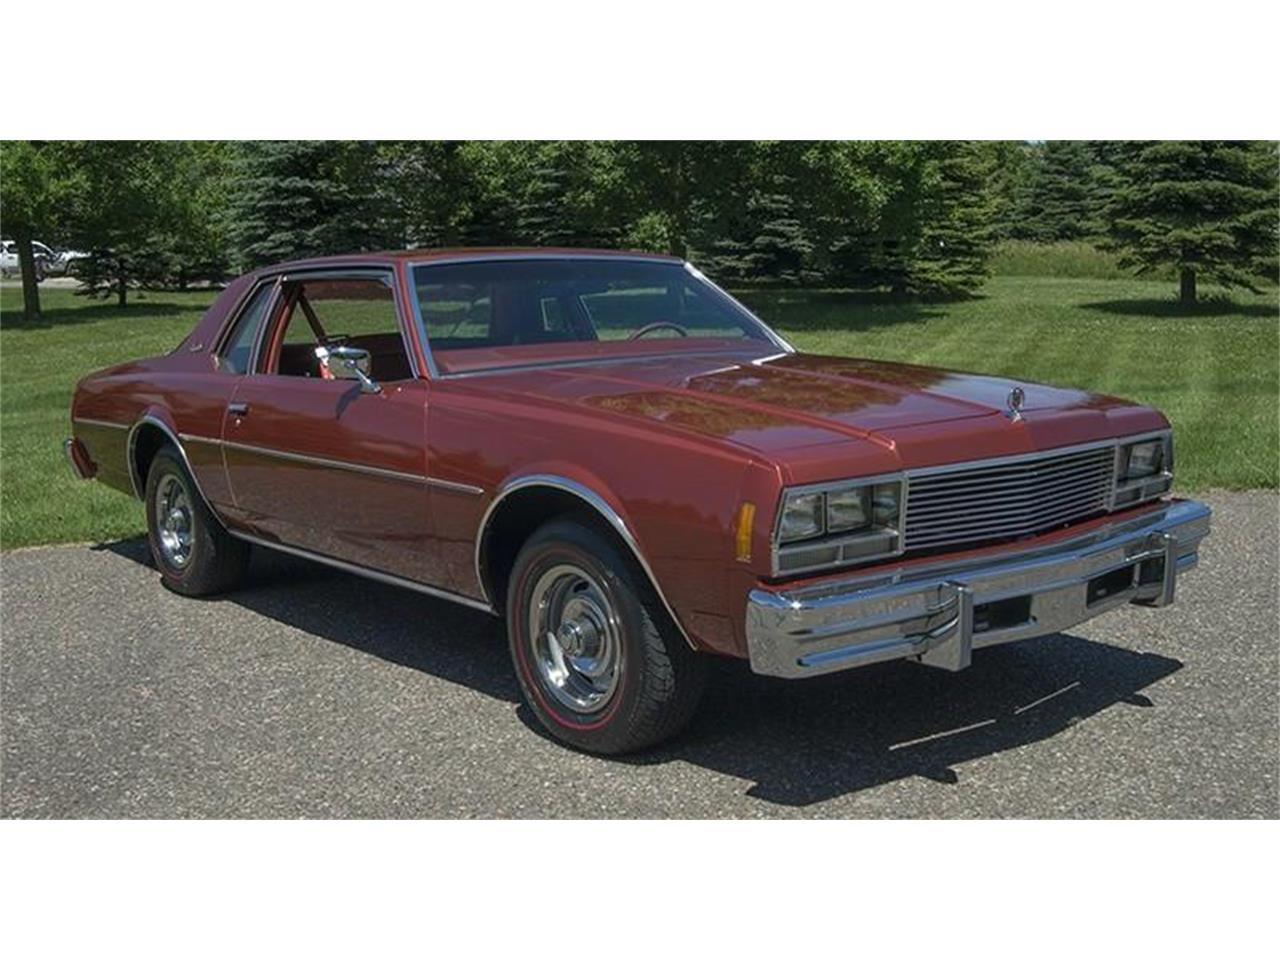 For Sale 1977 Chevrolet Impala In Roger Minnesota